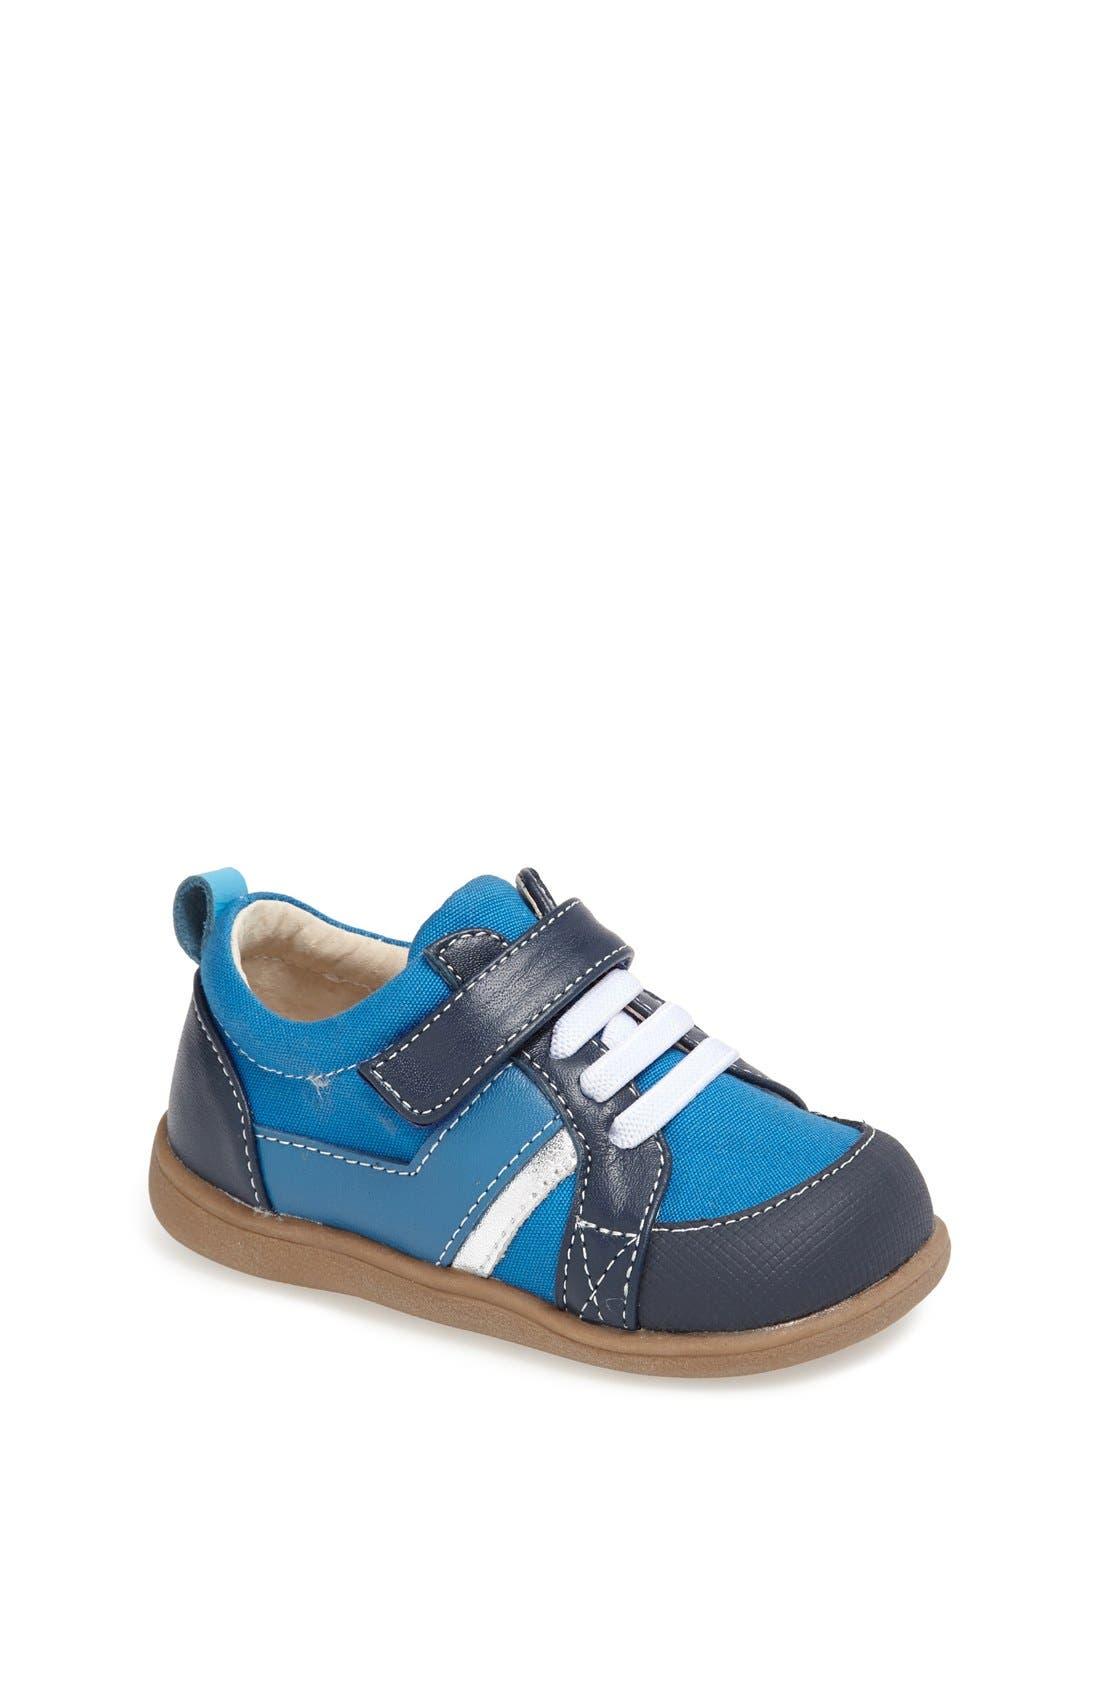 Alternate Image 1 Selected - See Kai Run 'Cash' Sneaker (Baby & Walker)